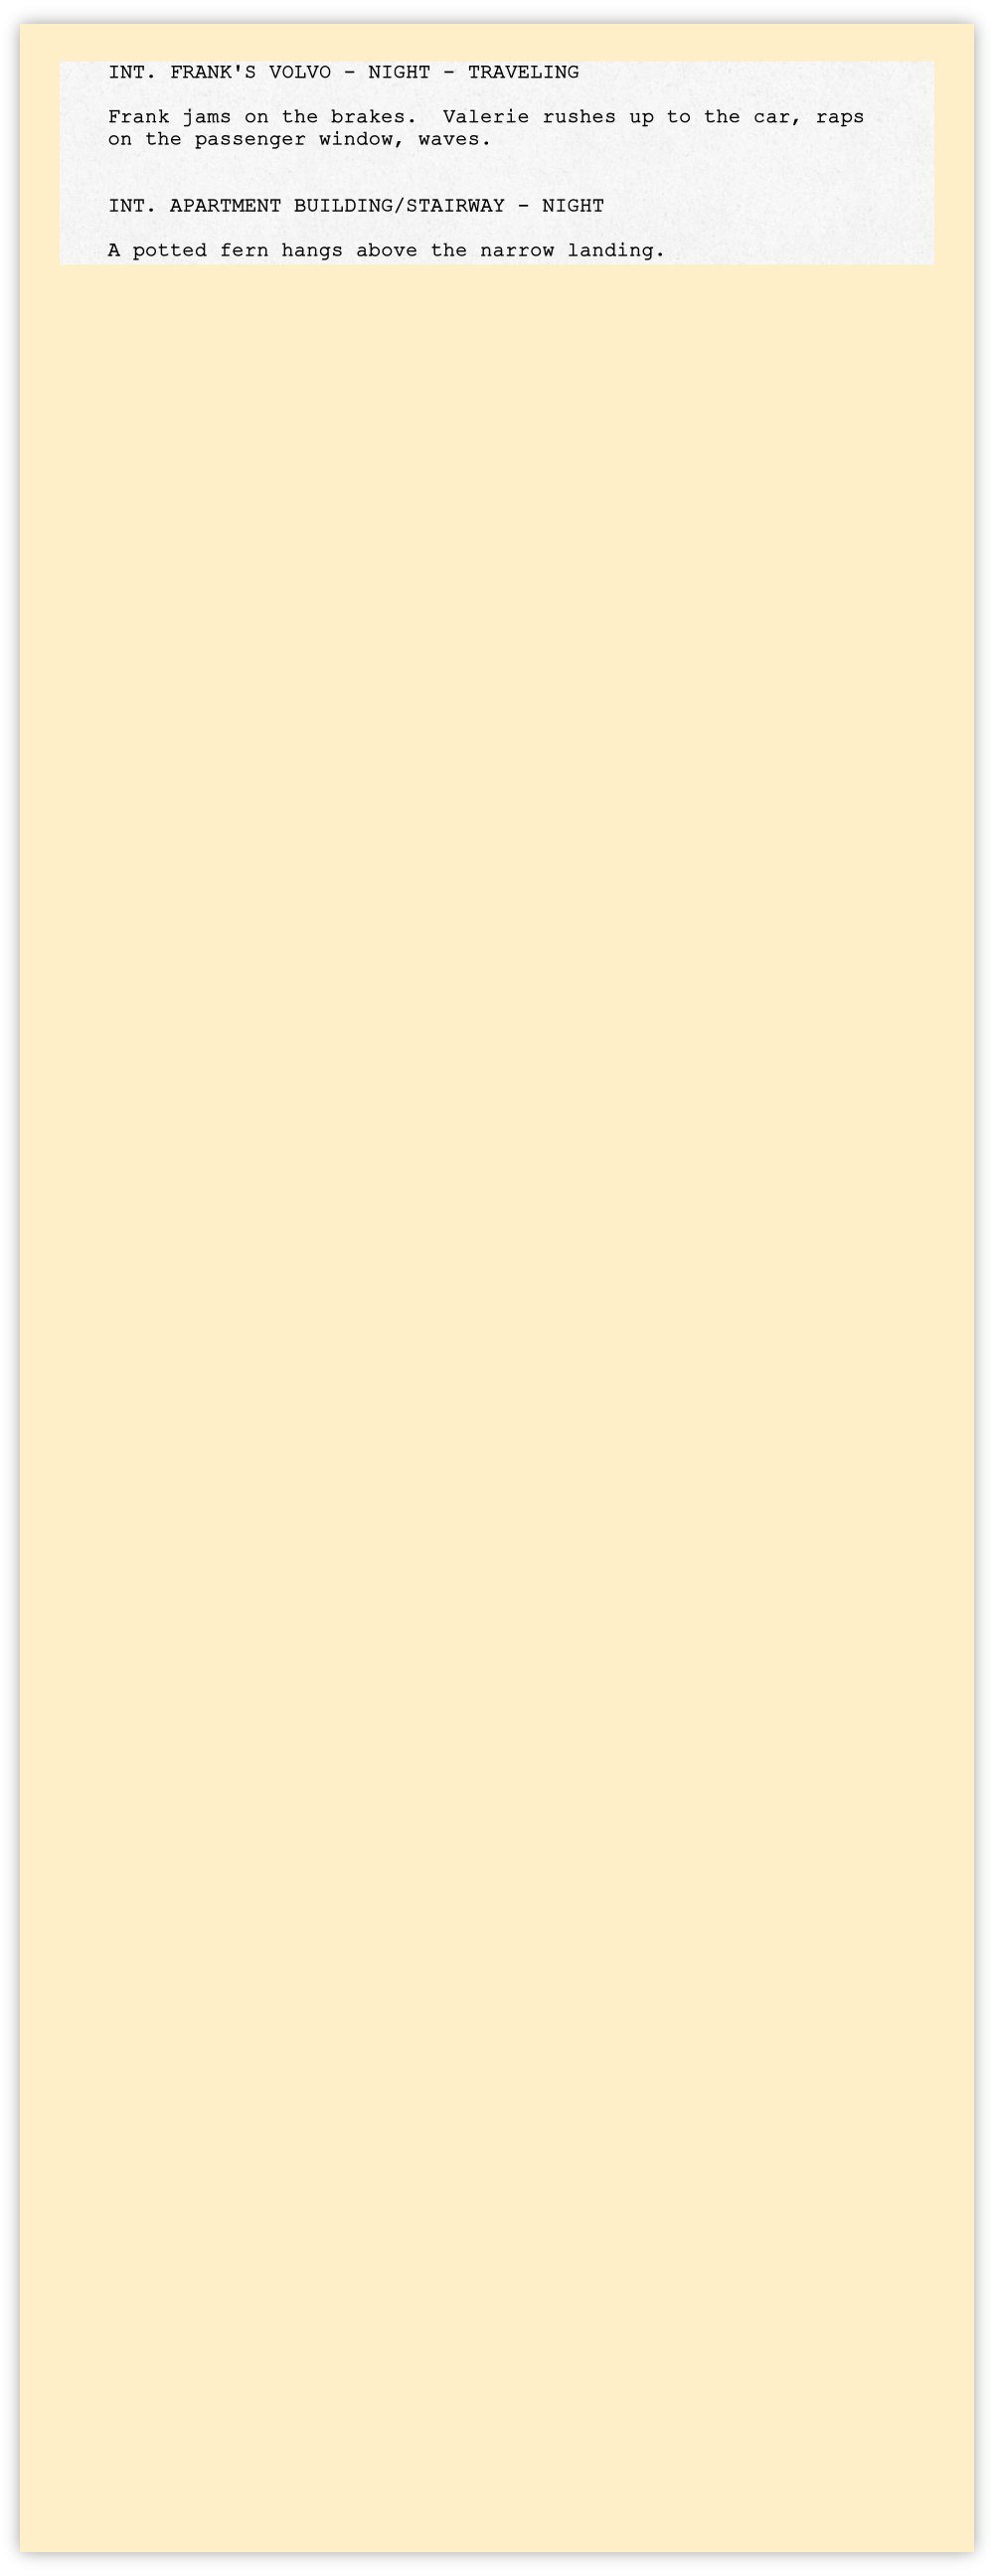 post dating definition Define postdate postdate synonyms, postdate pronunciation, postdate translation, english dictionary definition of postdate trv post at d , post at ng ,.